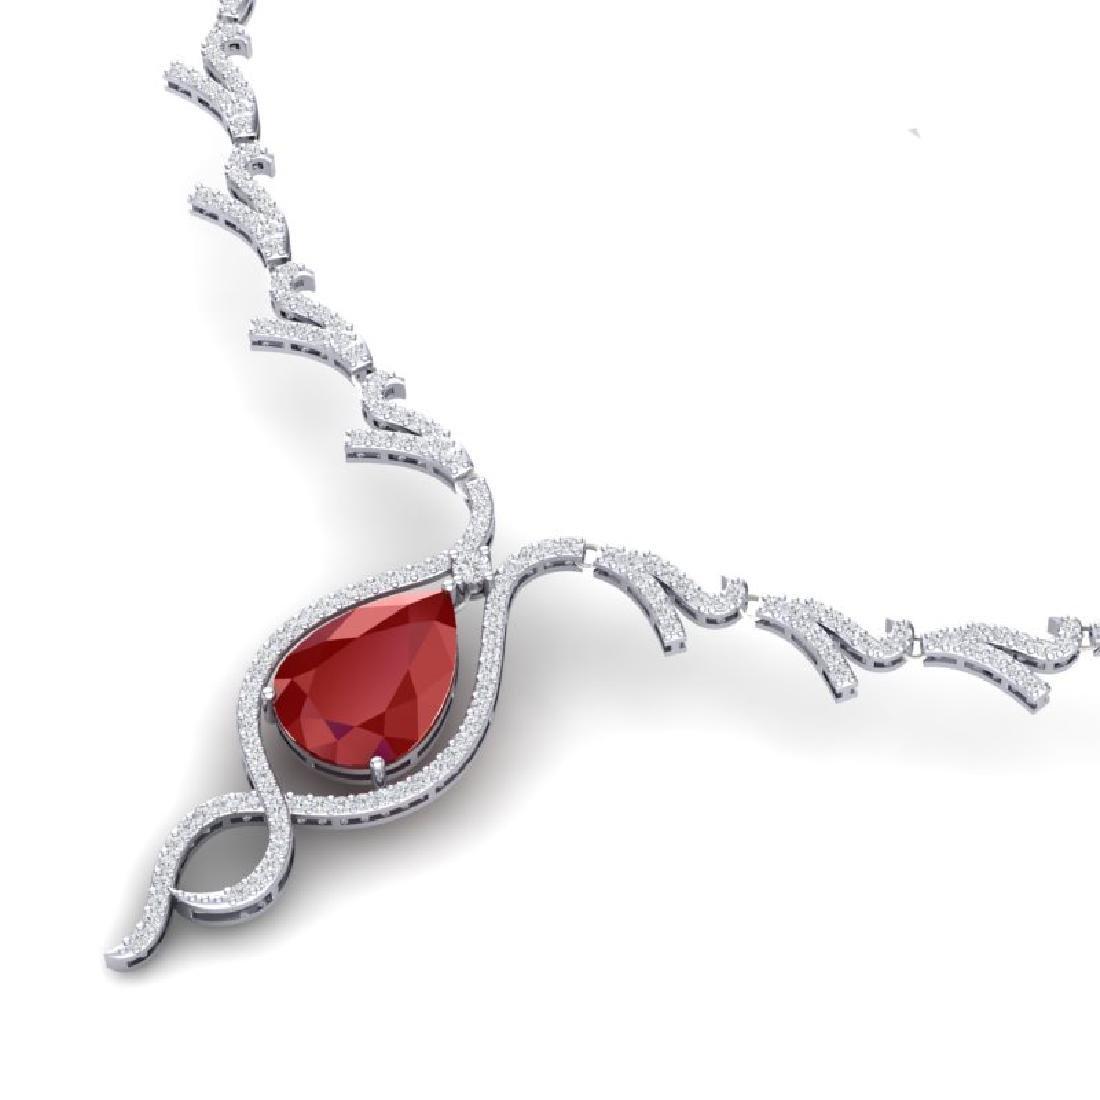 23.43 CTW Royalty Ruby & VS Diamond Necklace 18K White